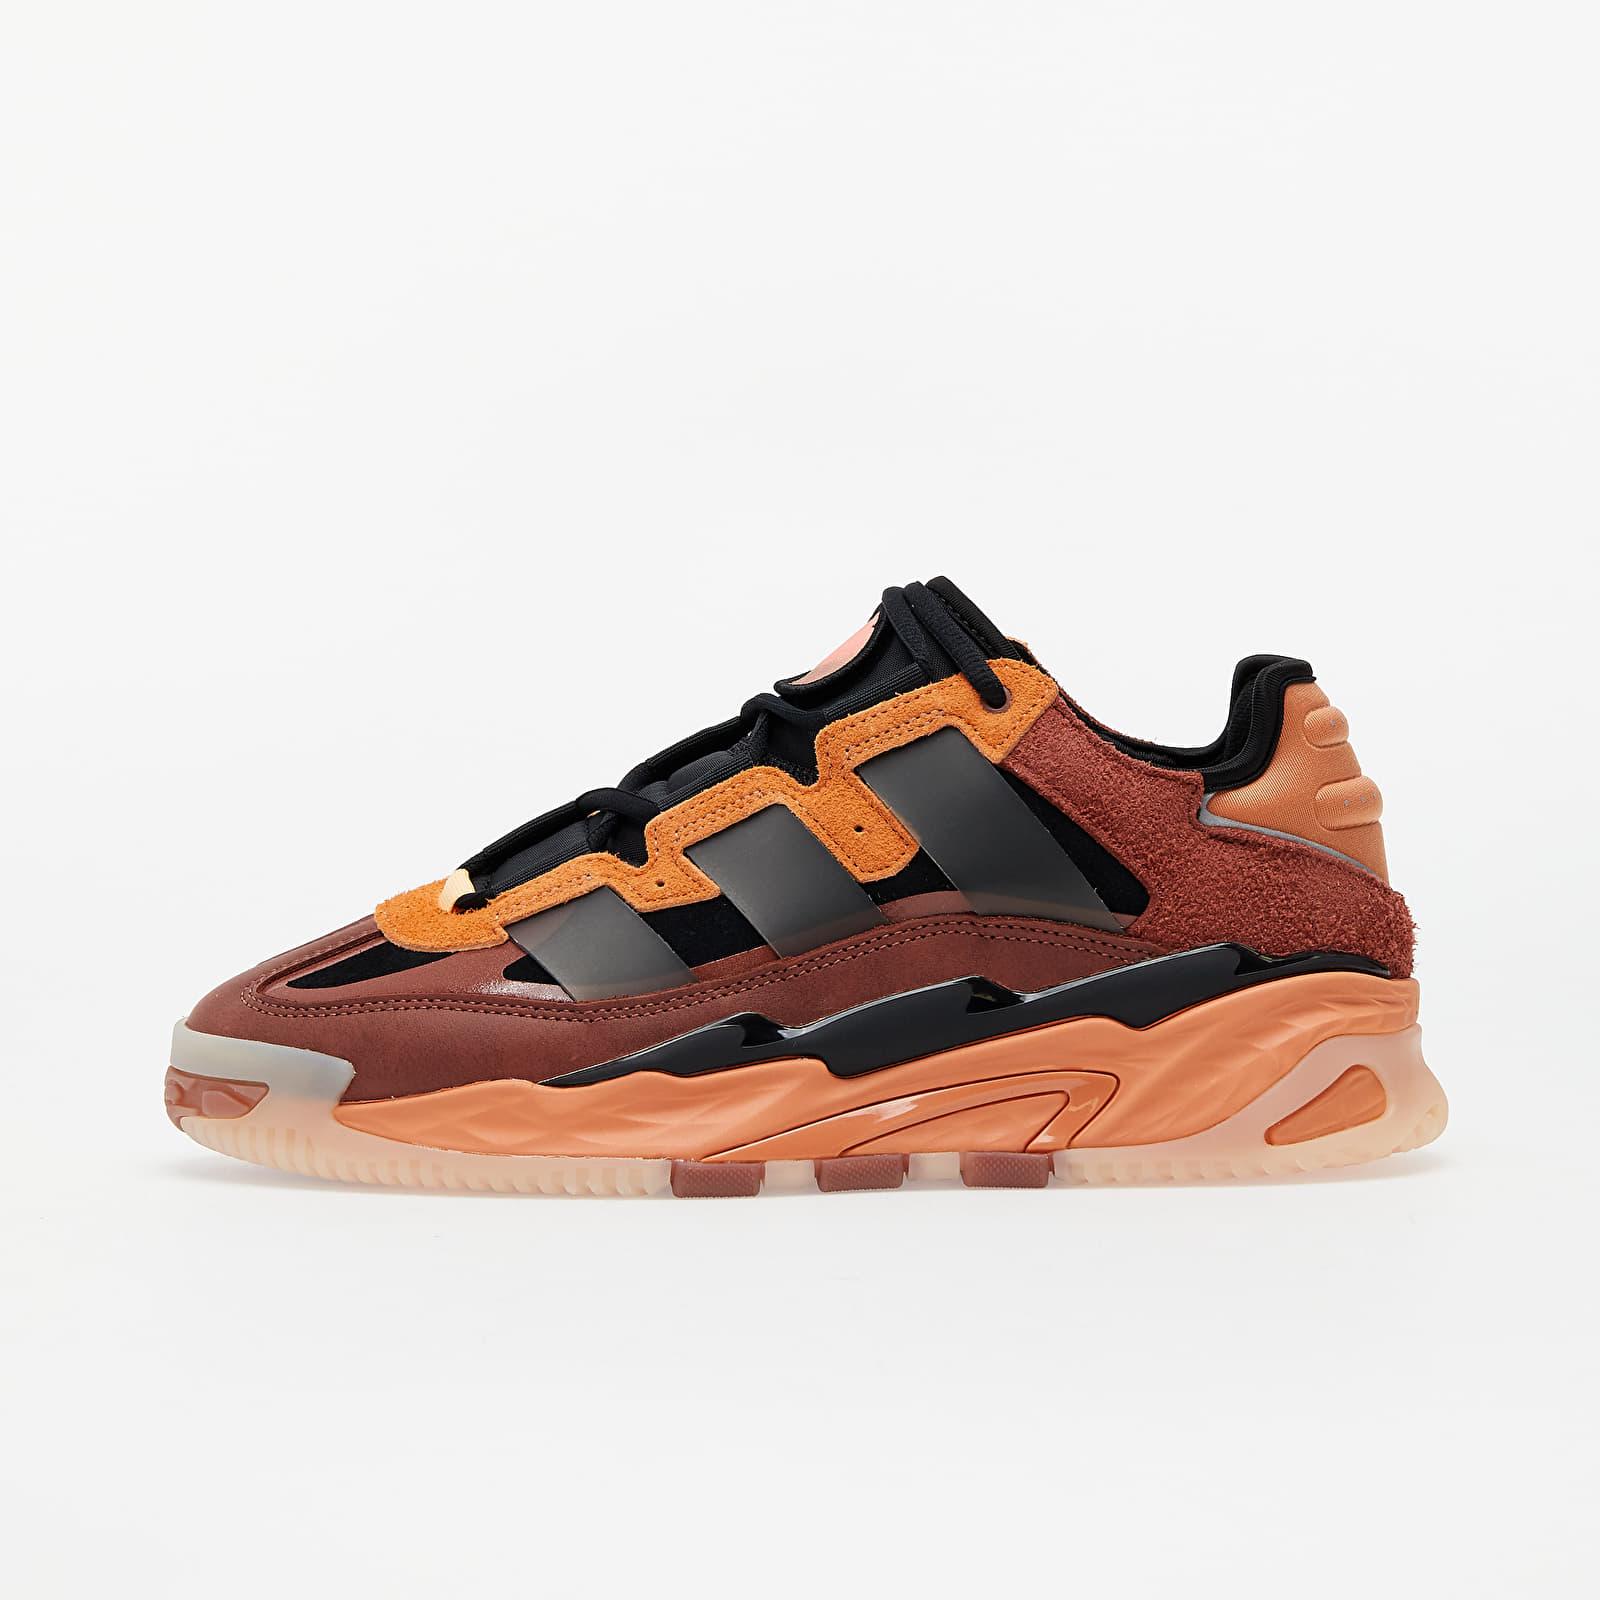 adidas Niteball Hazy Copper/ Core Black/ Acid Orange FX7642